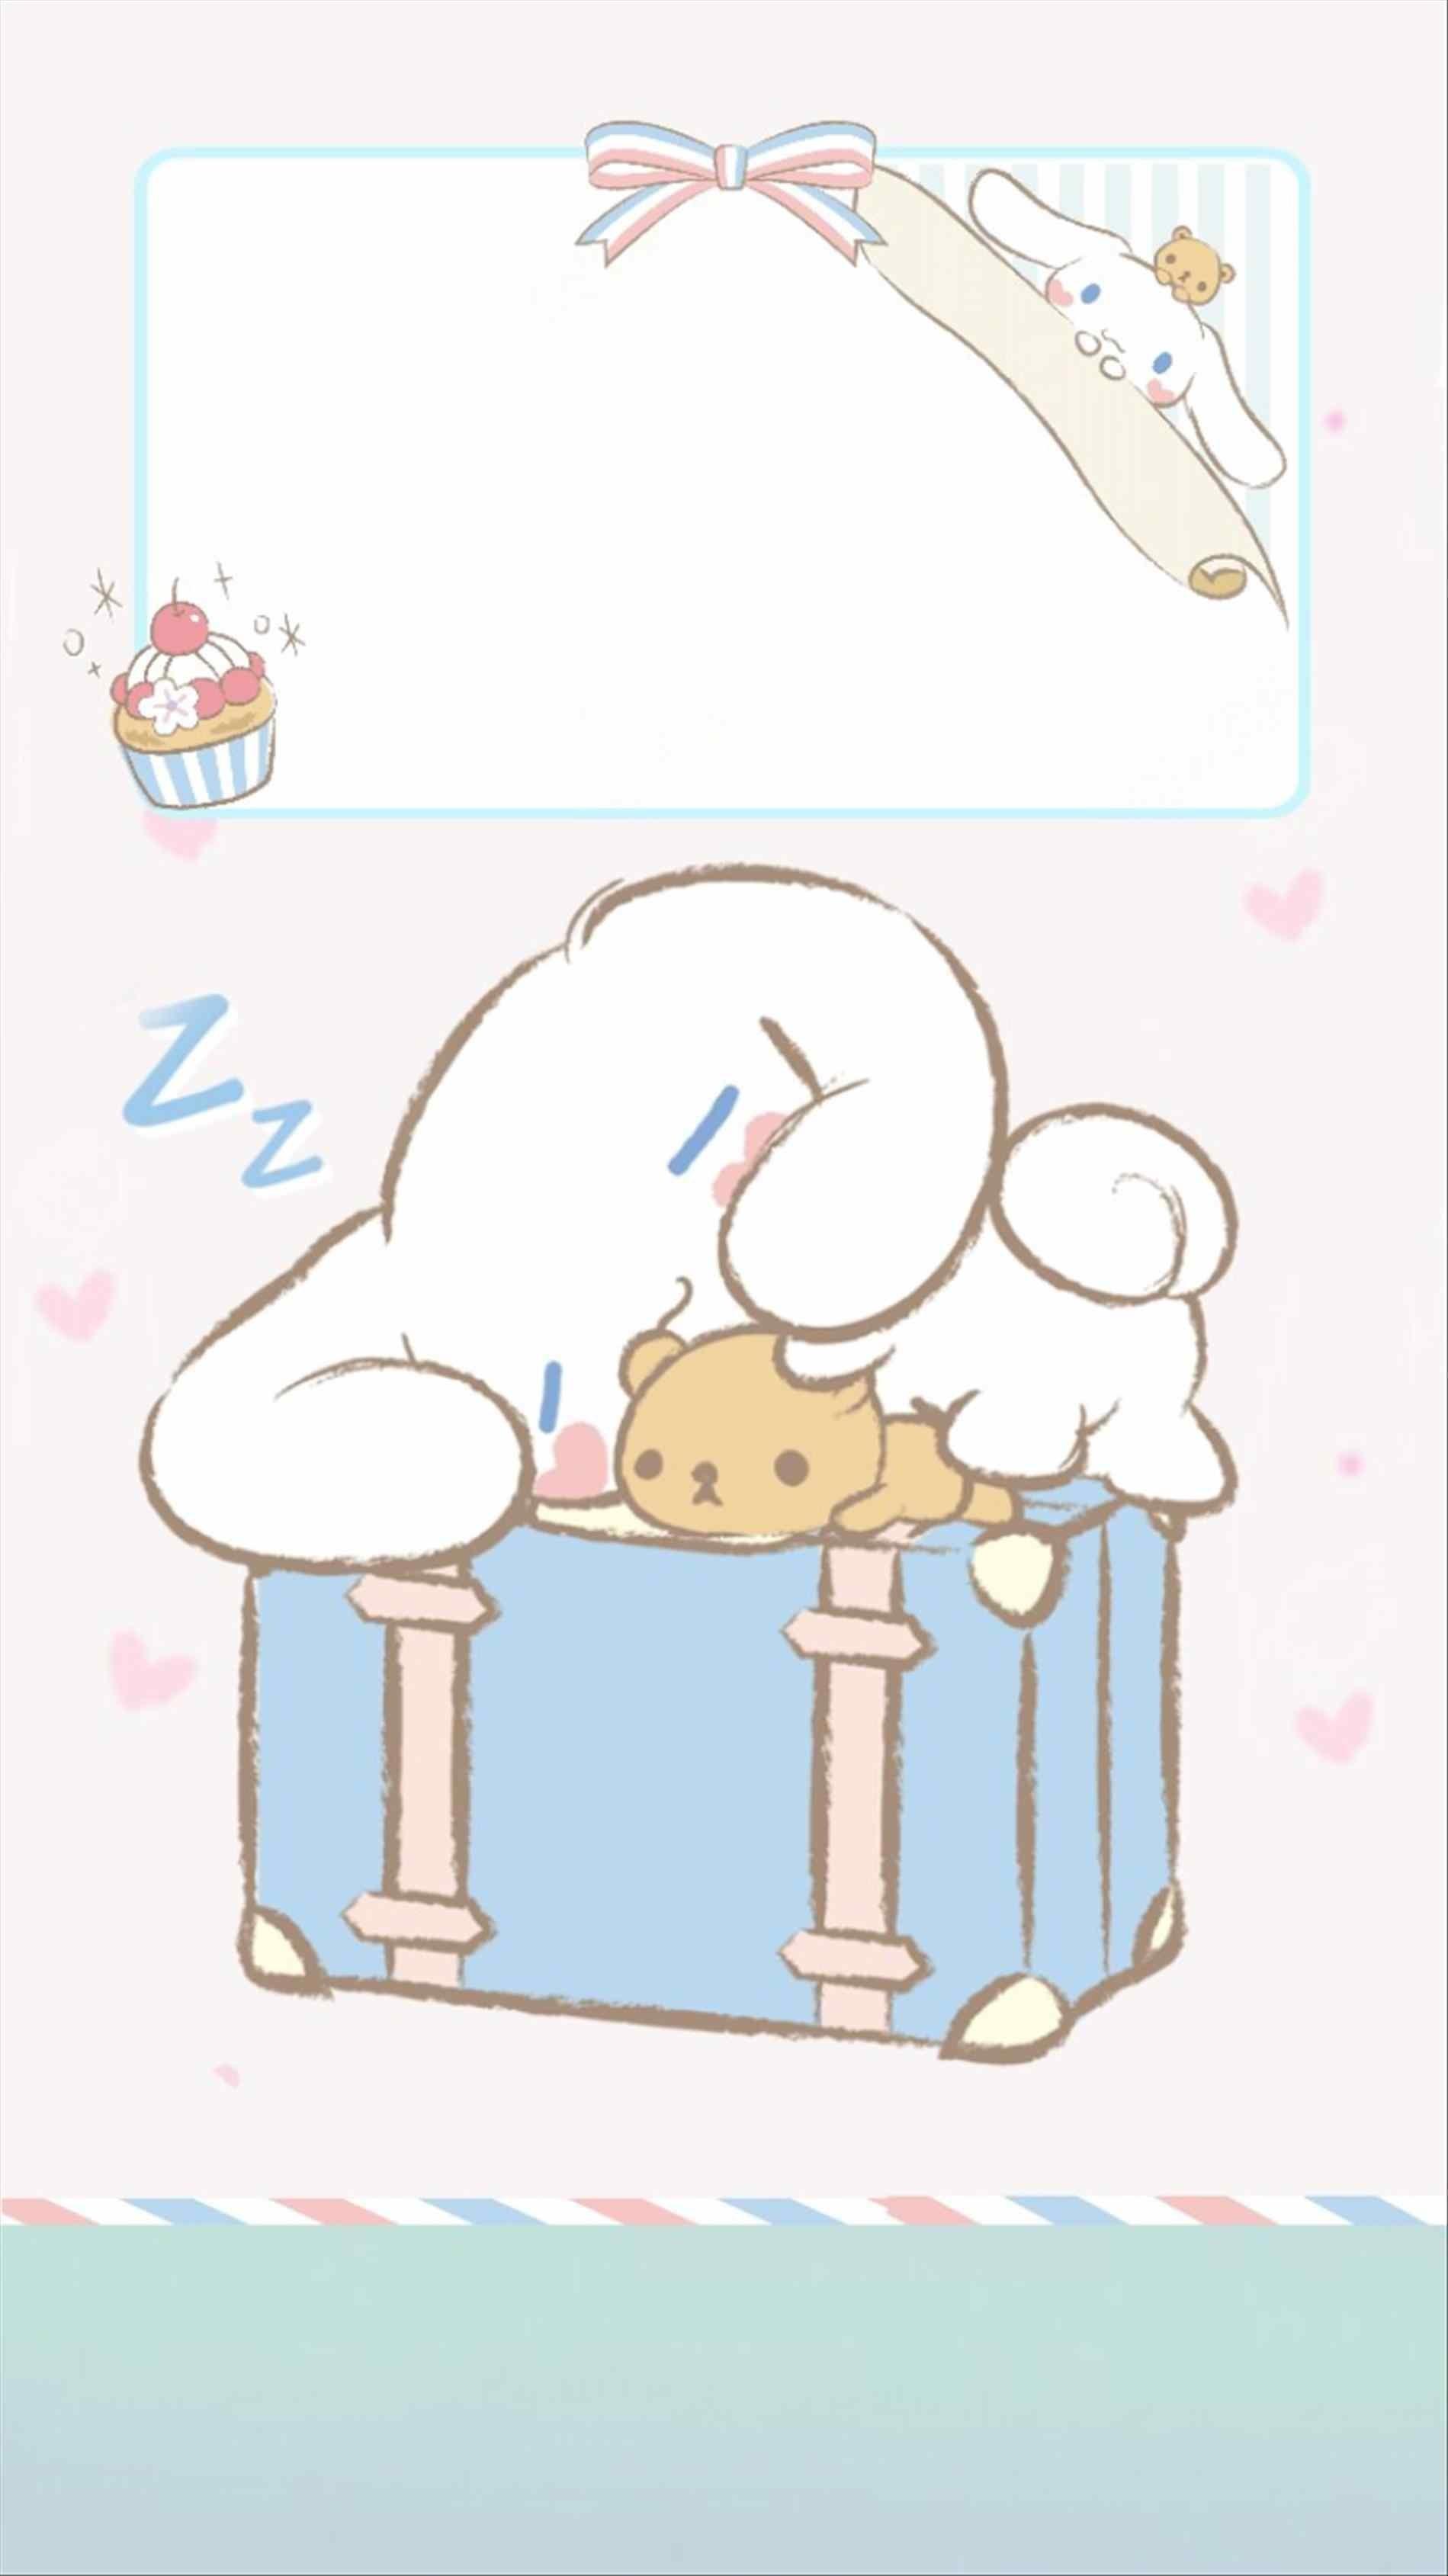 Res: 1899x3379, Fanpop Desktop Background Photo Collection Sanrio Adorable Photo  Cinnamoroll Iphone Wallpaper Collection Sanrio Adorable Kawaii Phone